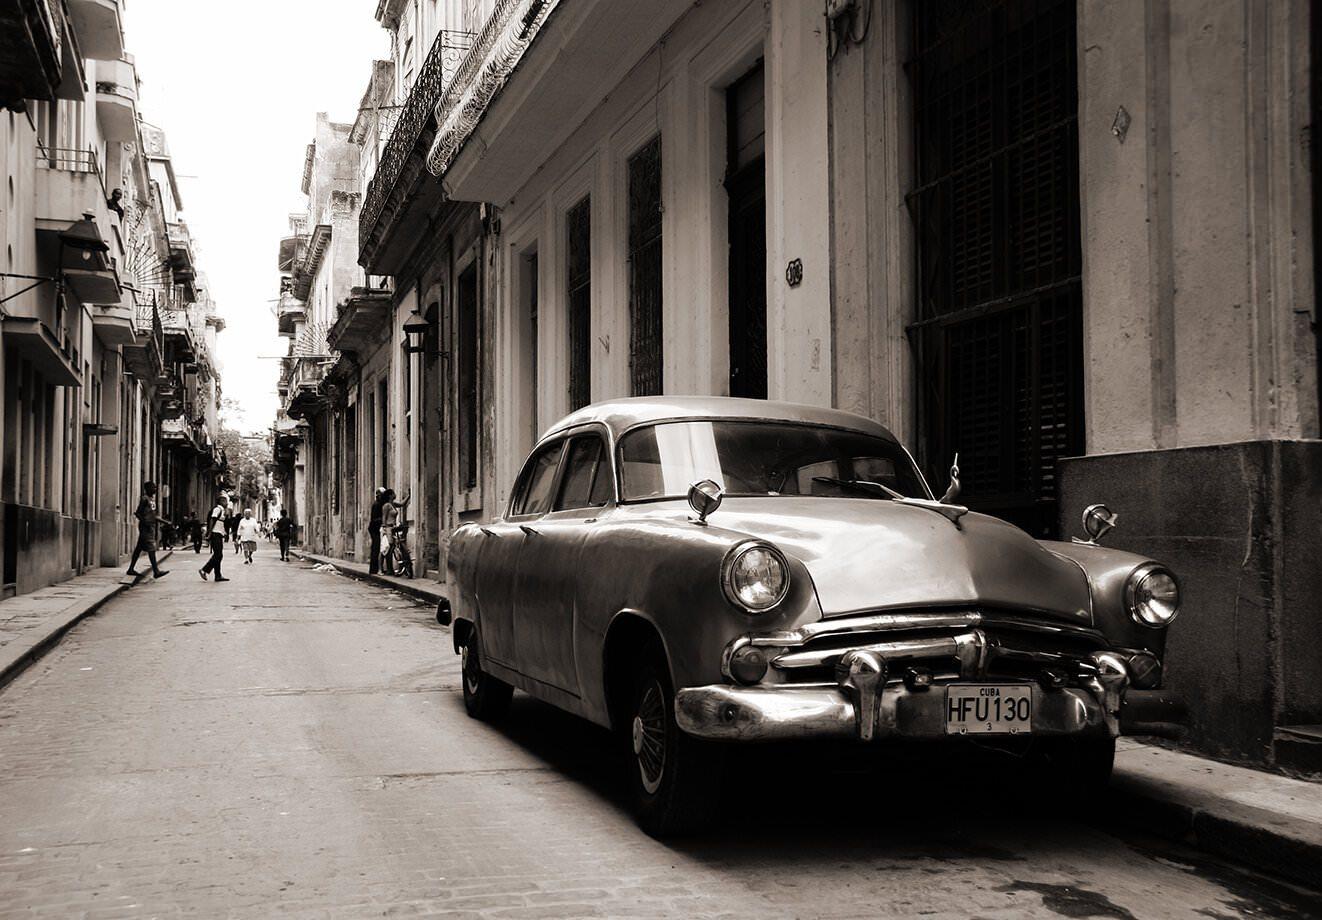 Havana+car+pretty+gritty